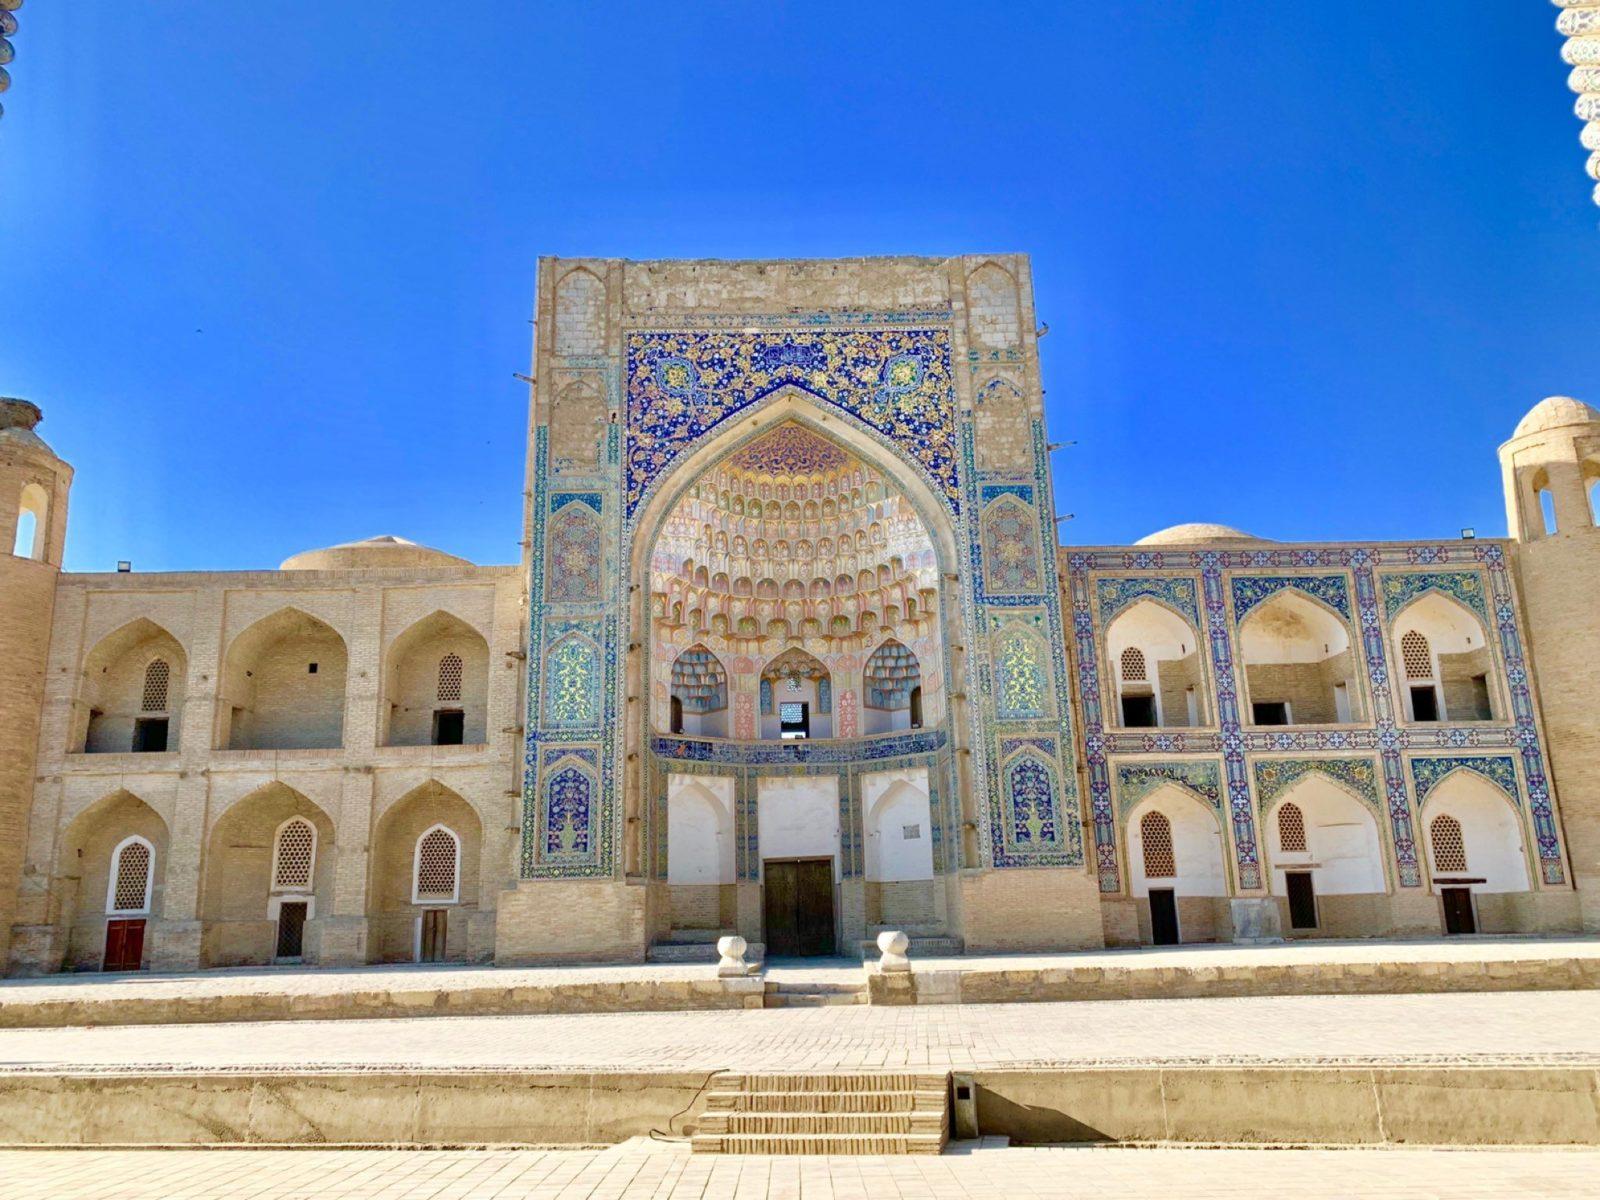 Train Ride and Overland Adventure in Uzbekistan